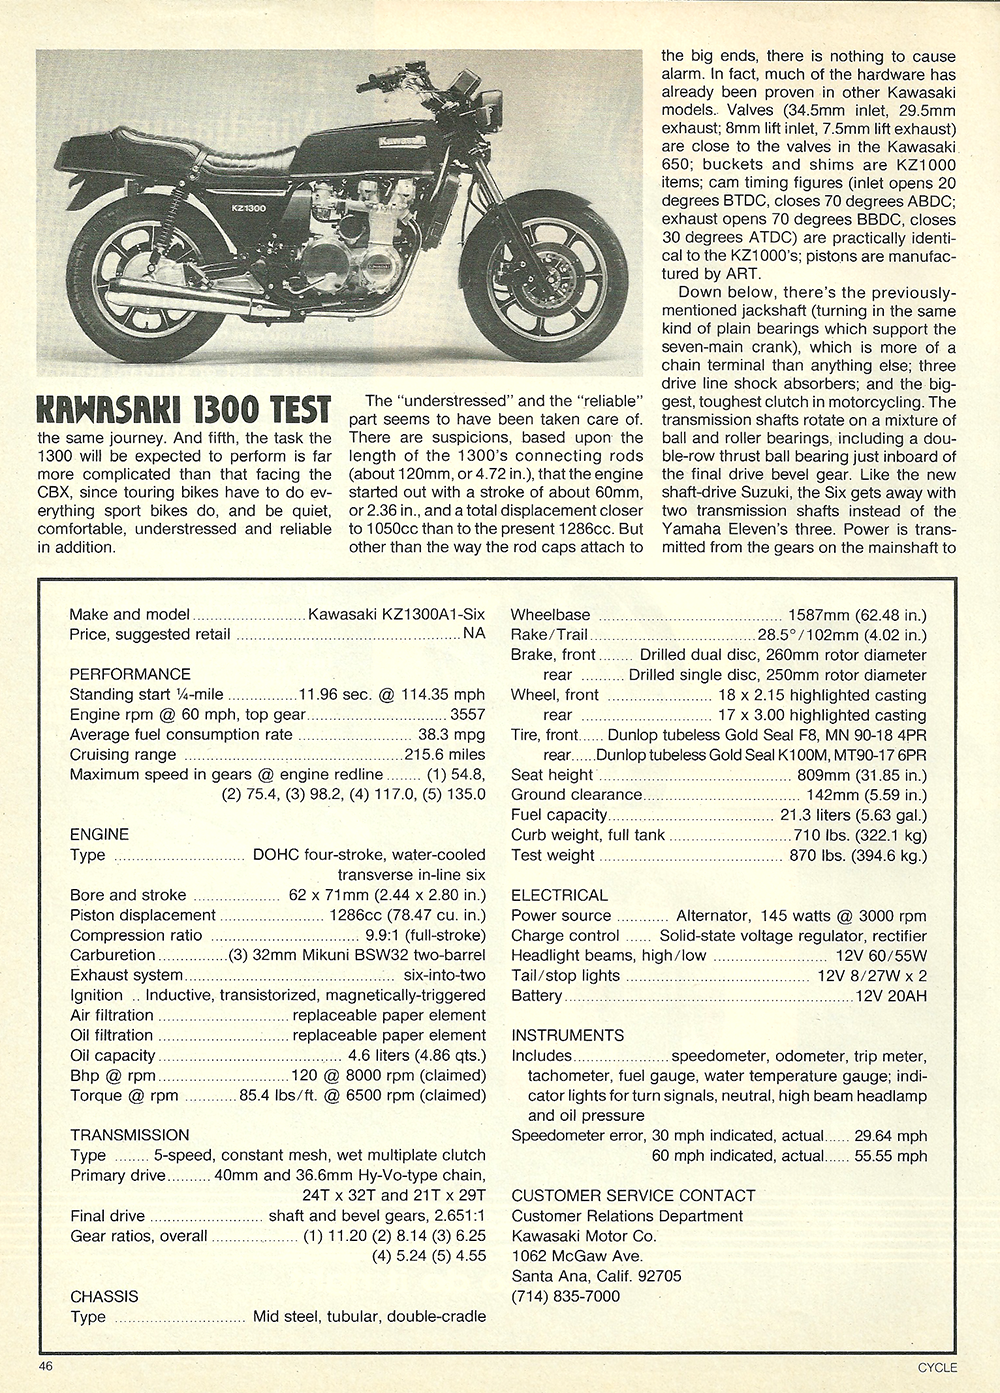 1979_Kawasaki_KZ1300_test_pg8.png